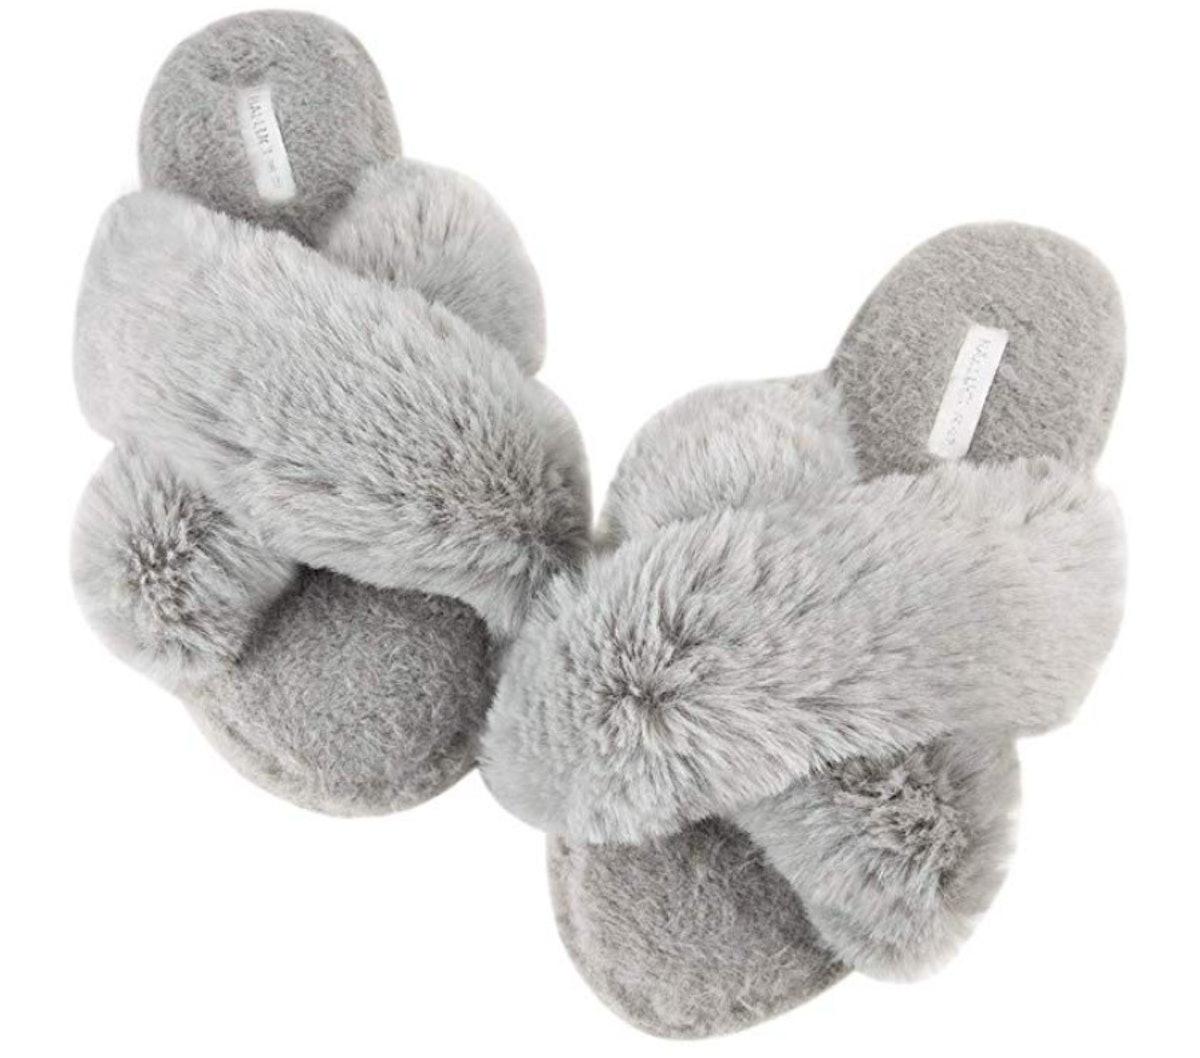 Women's Cross Band Soft Plush Fleece Slippers